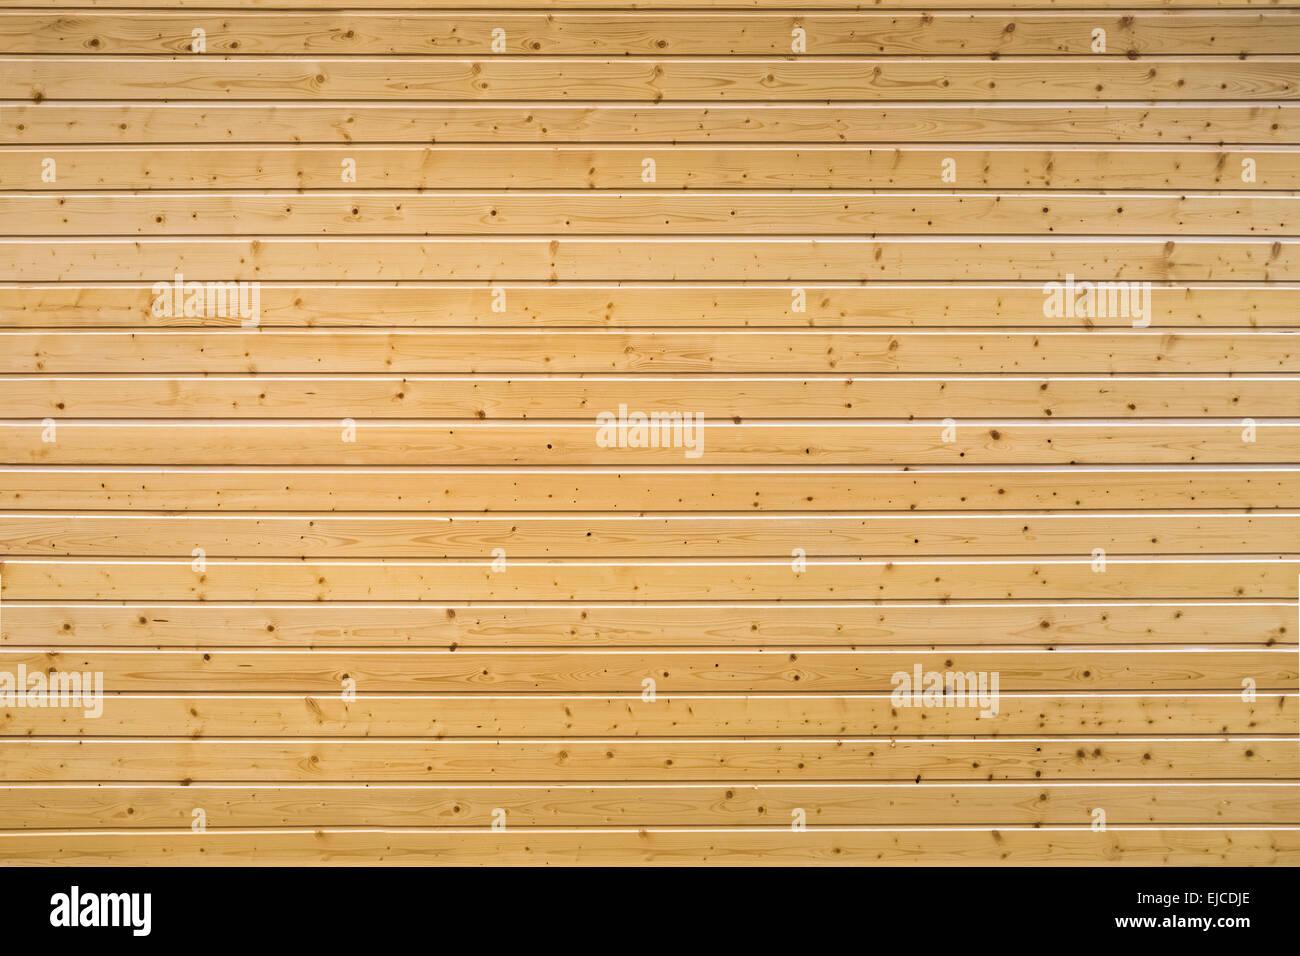 Horizontal Panel Wall Stock Photos & Horizontal Panel Wall Stock ...